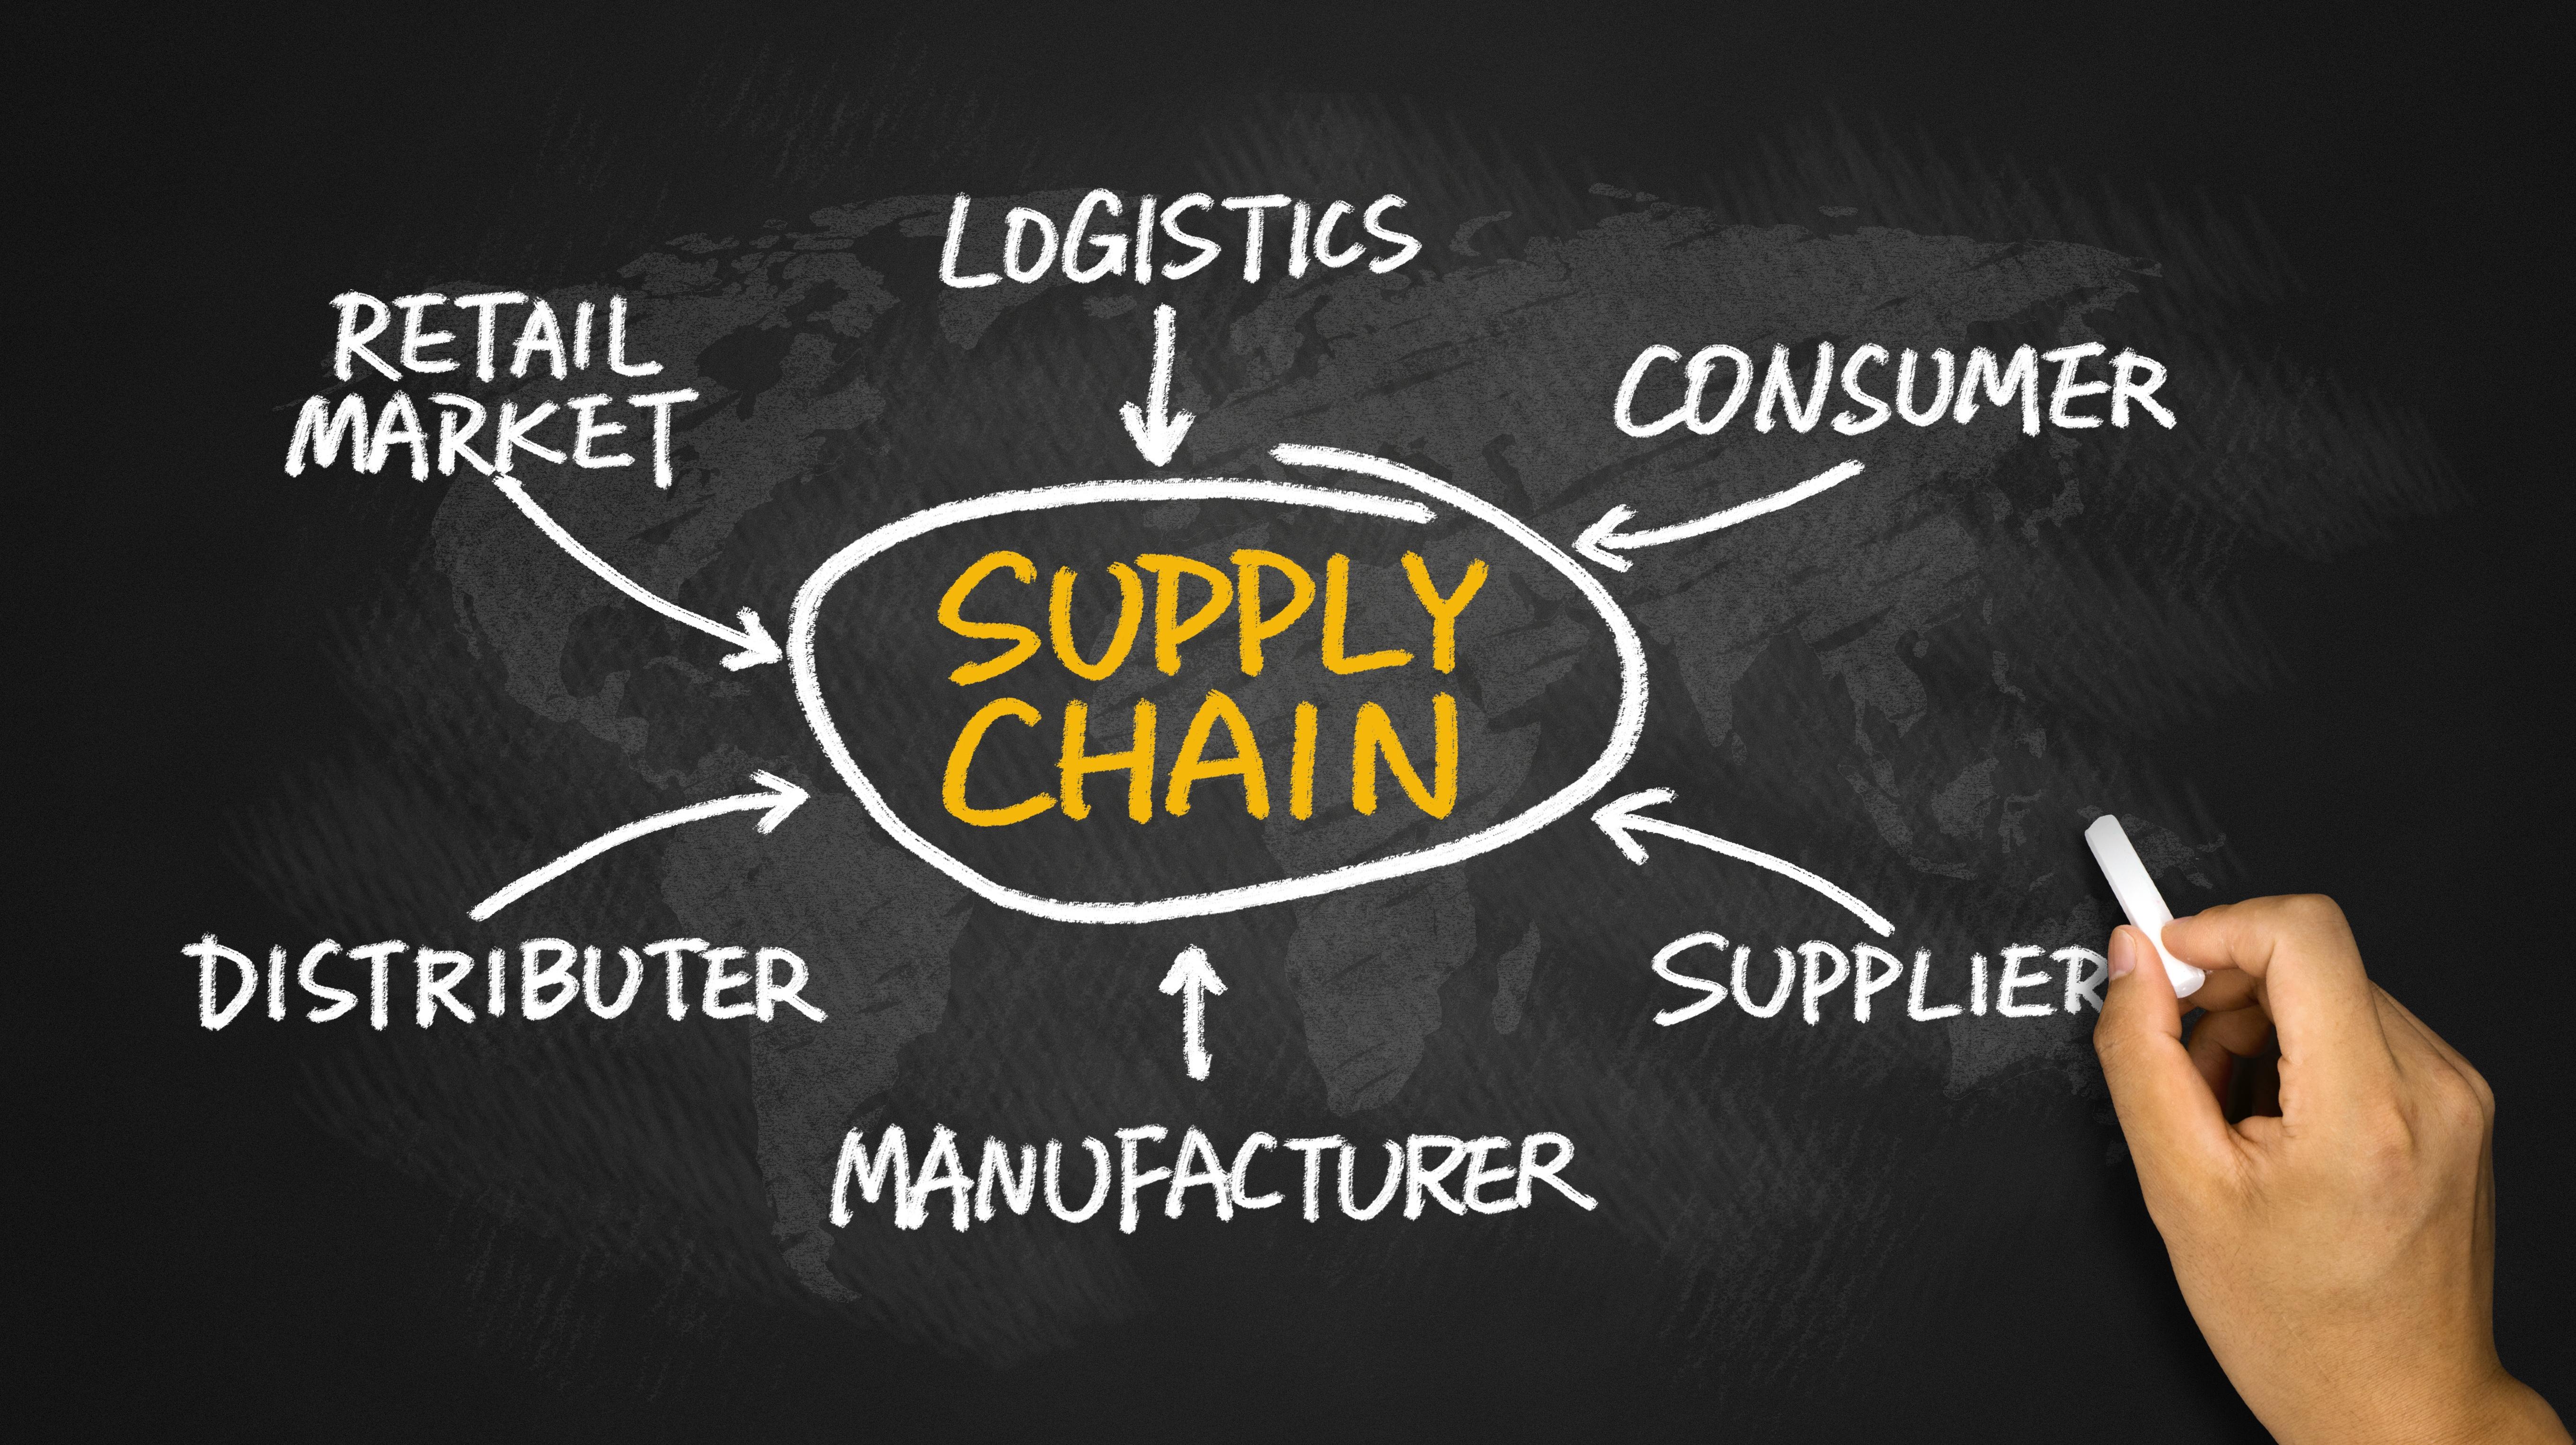 Supply chain logistics factors